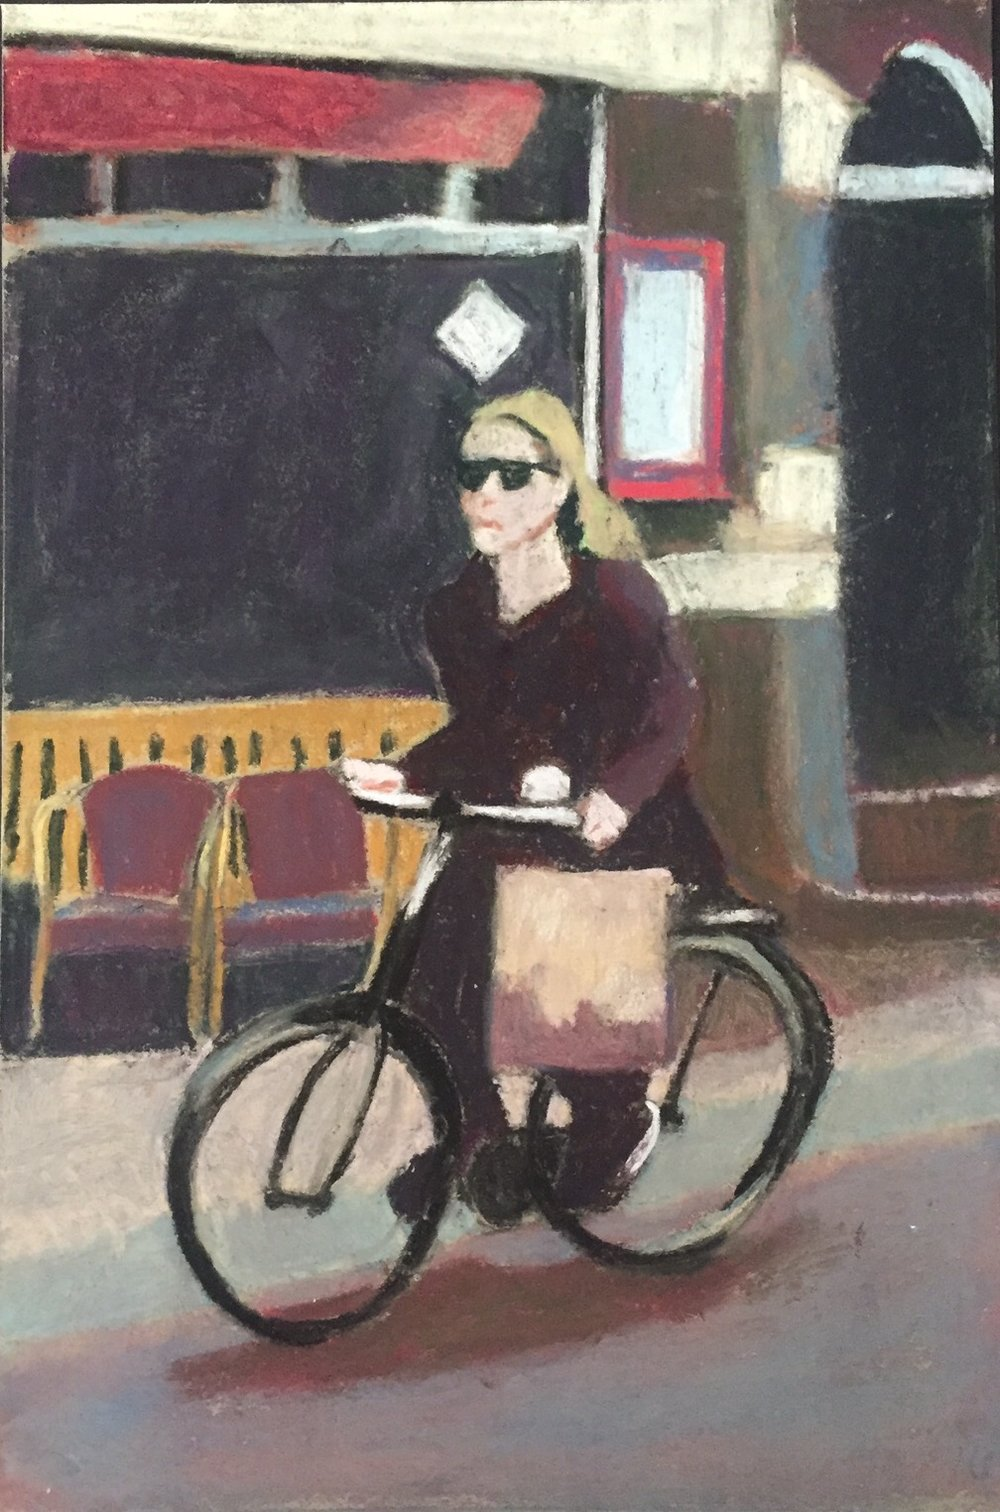 Amsterdam Peddler